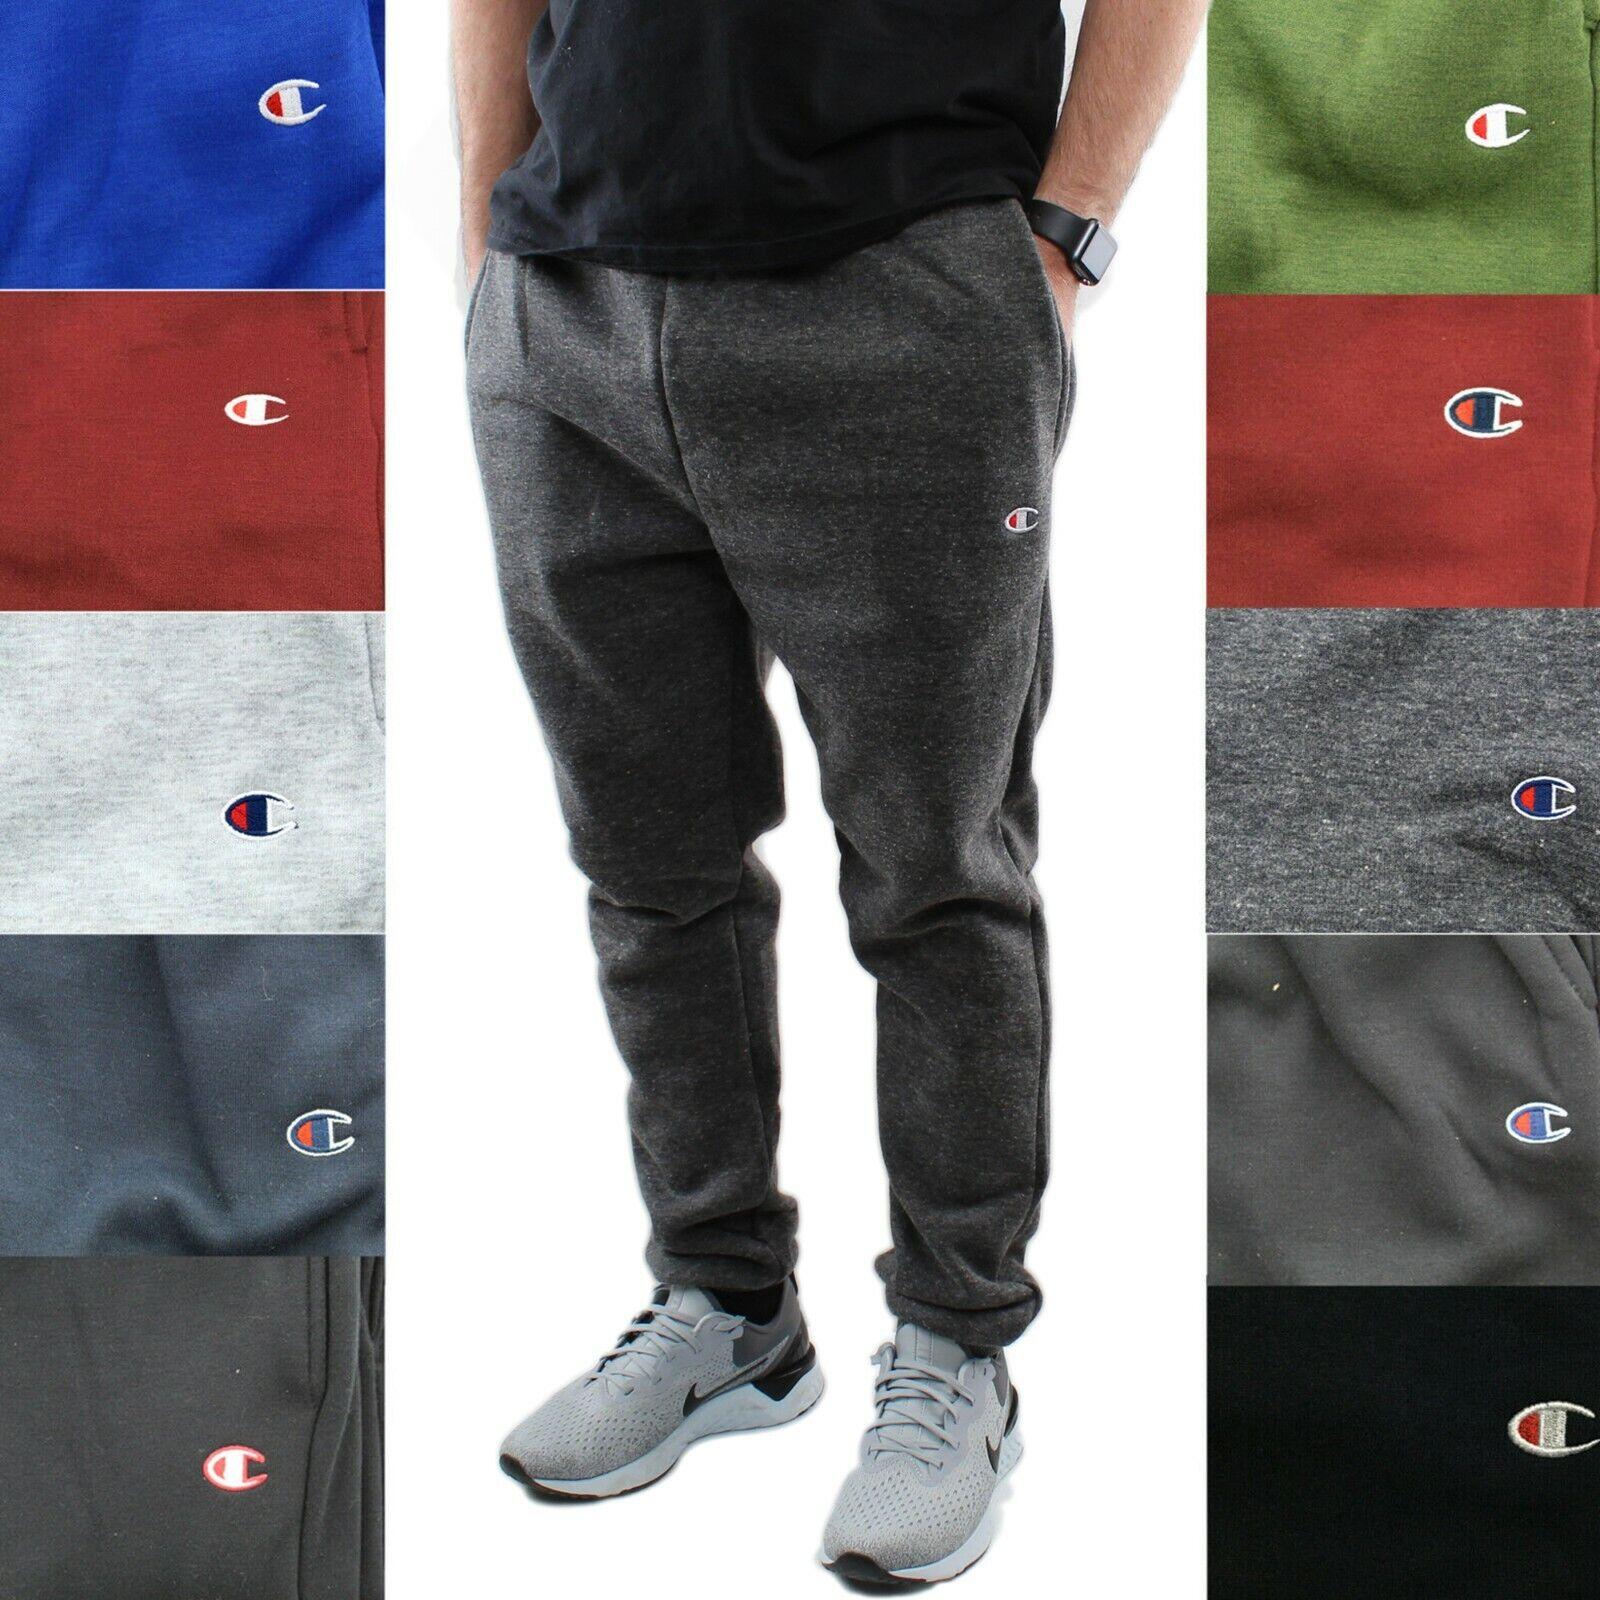 Champion Fleece Joggers Sweatpants Men's Athletic Activewear